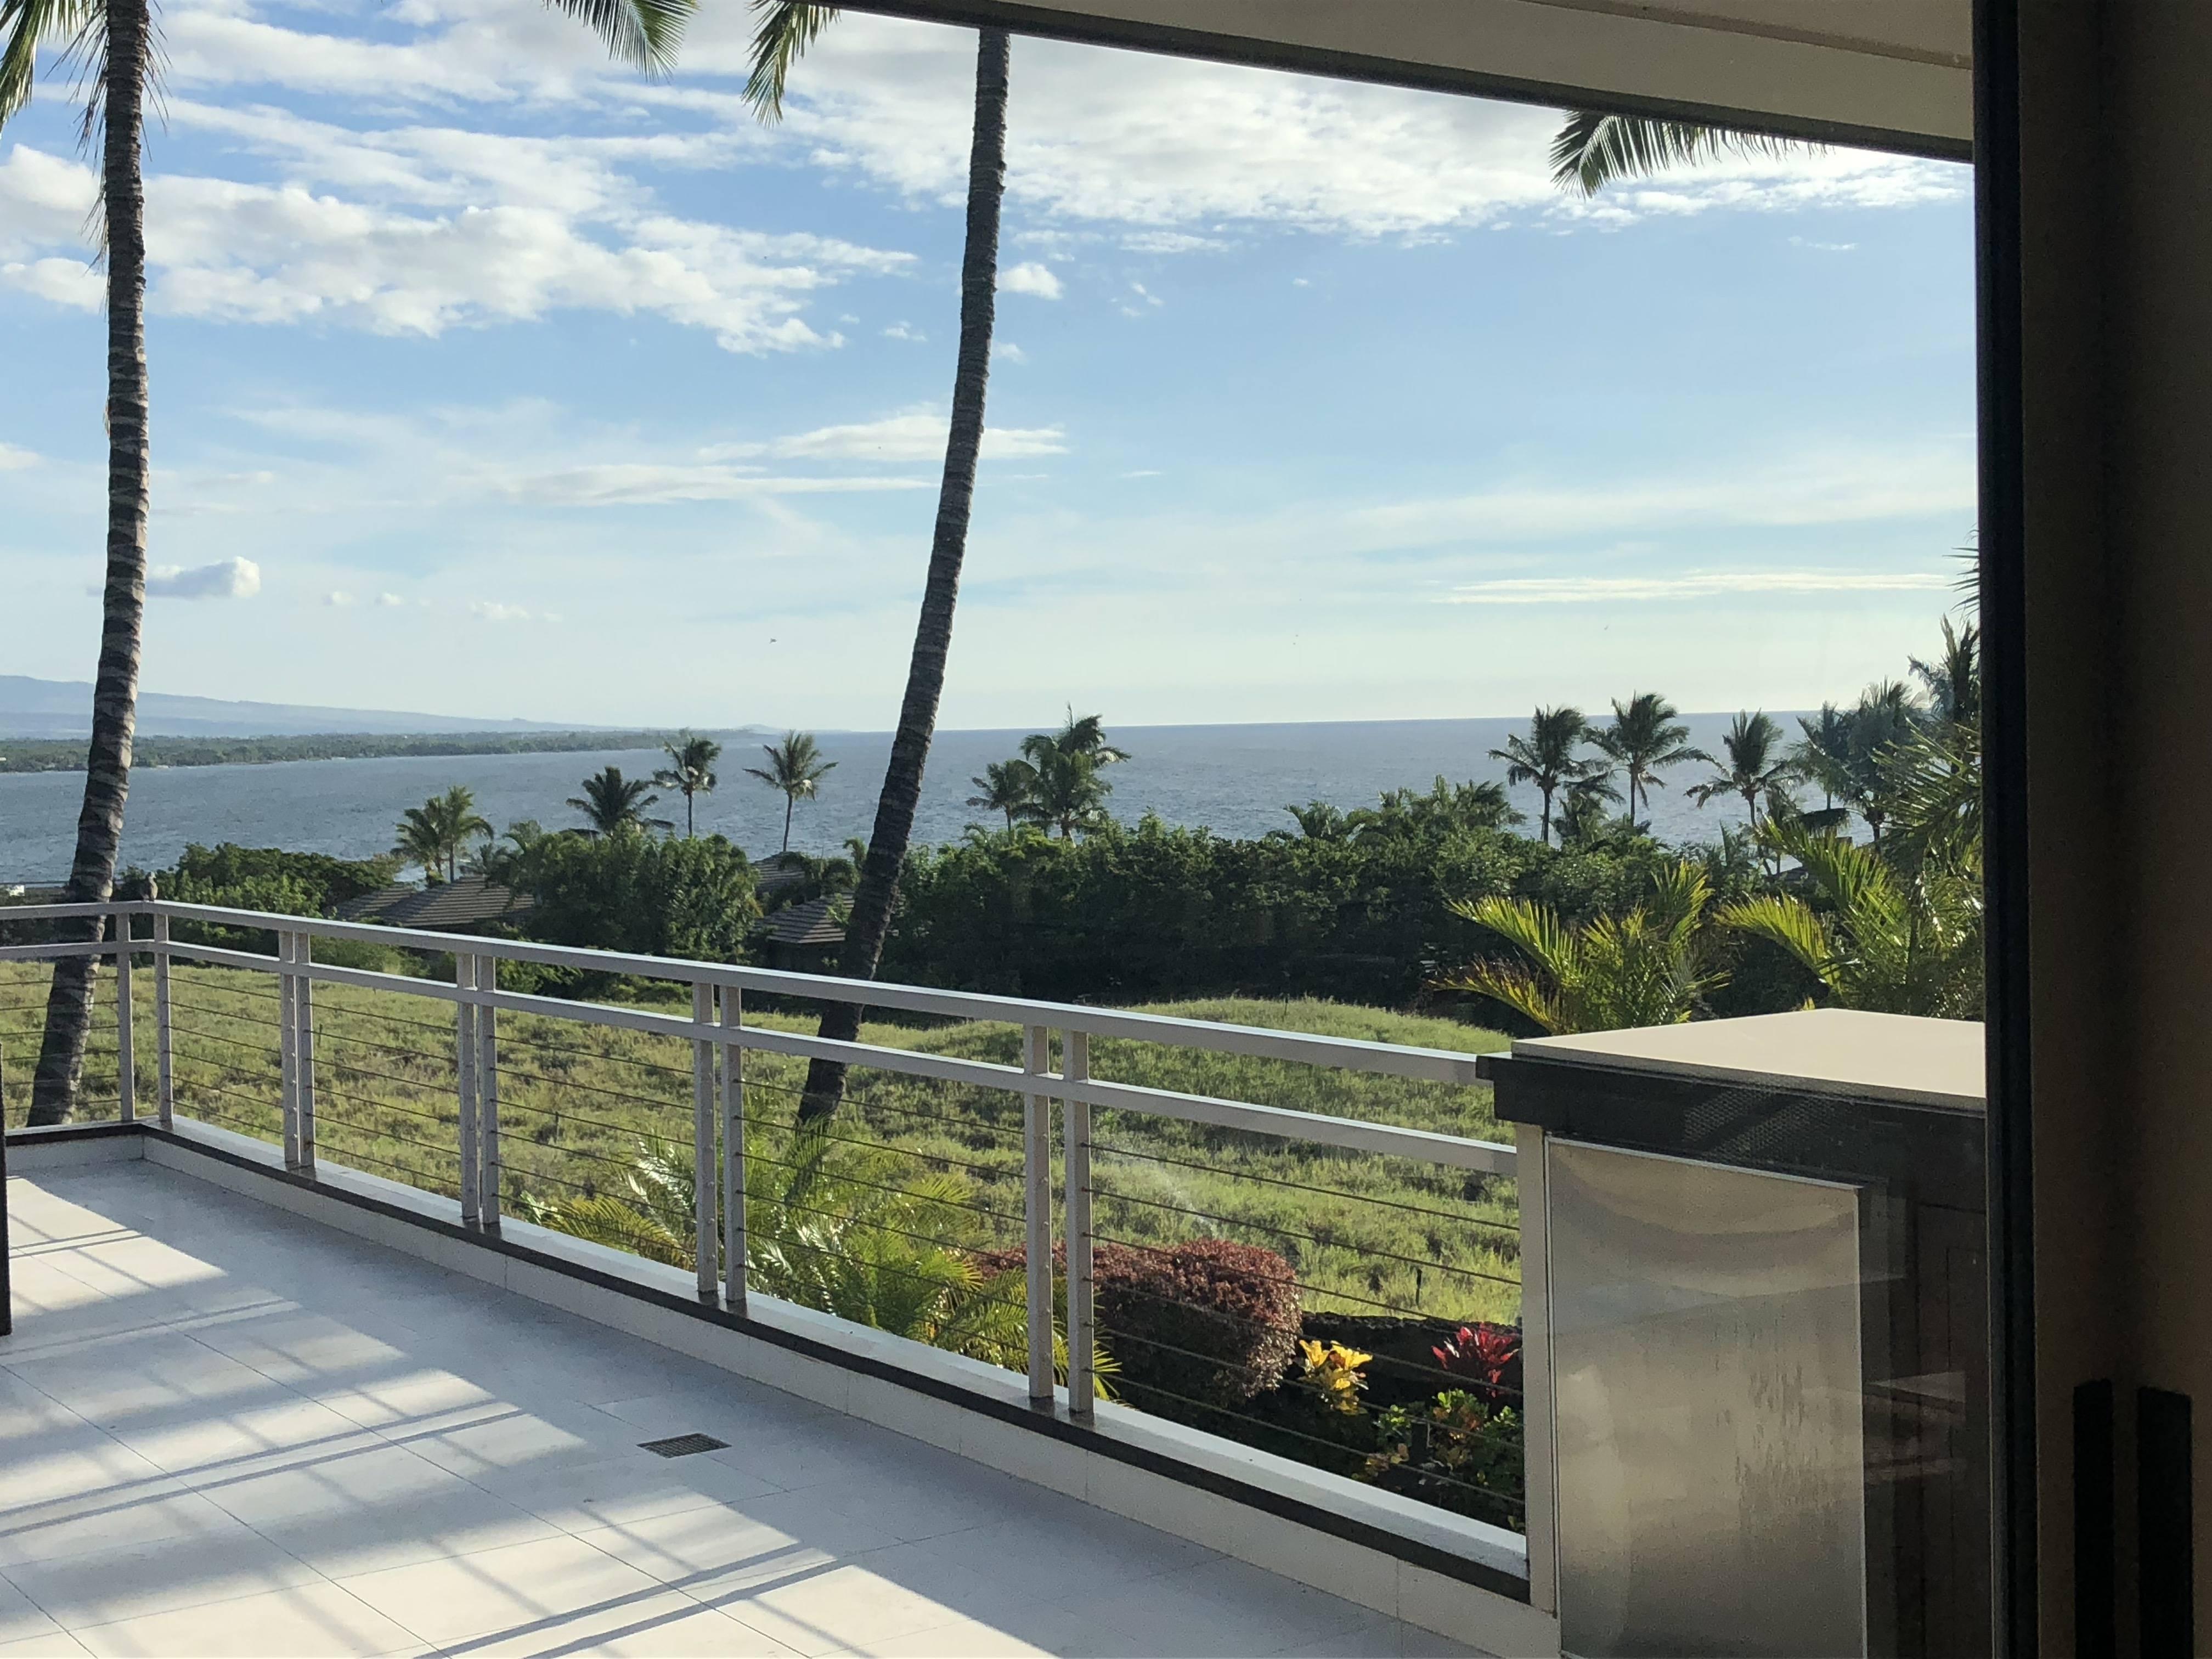 Coastline Ocean View from Bluffs at Mauna Kea home